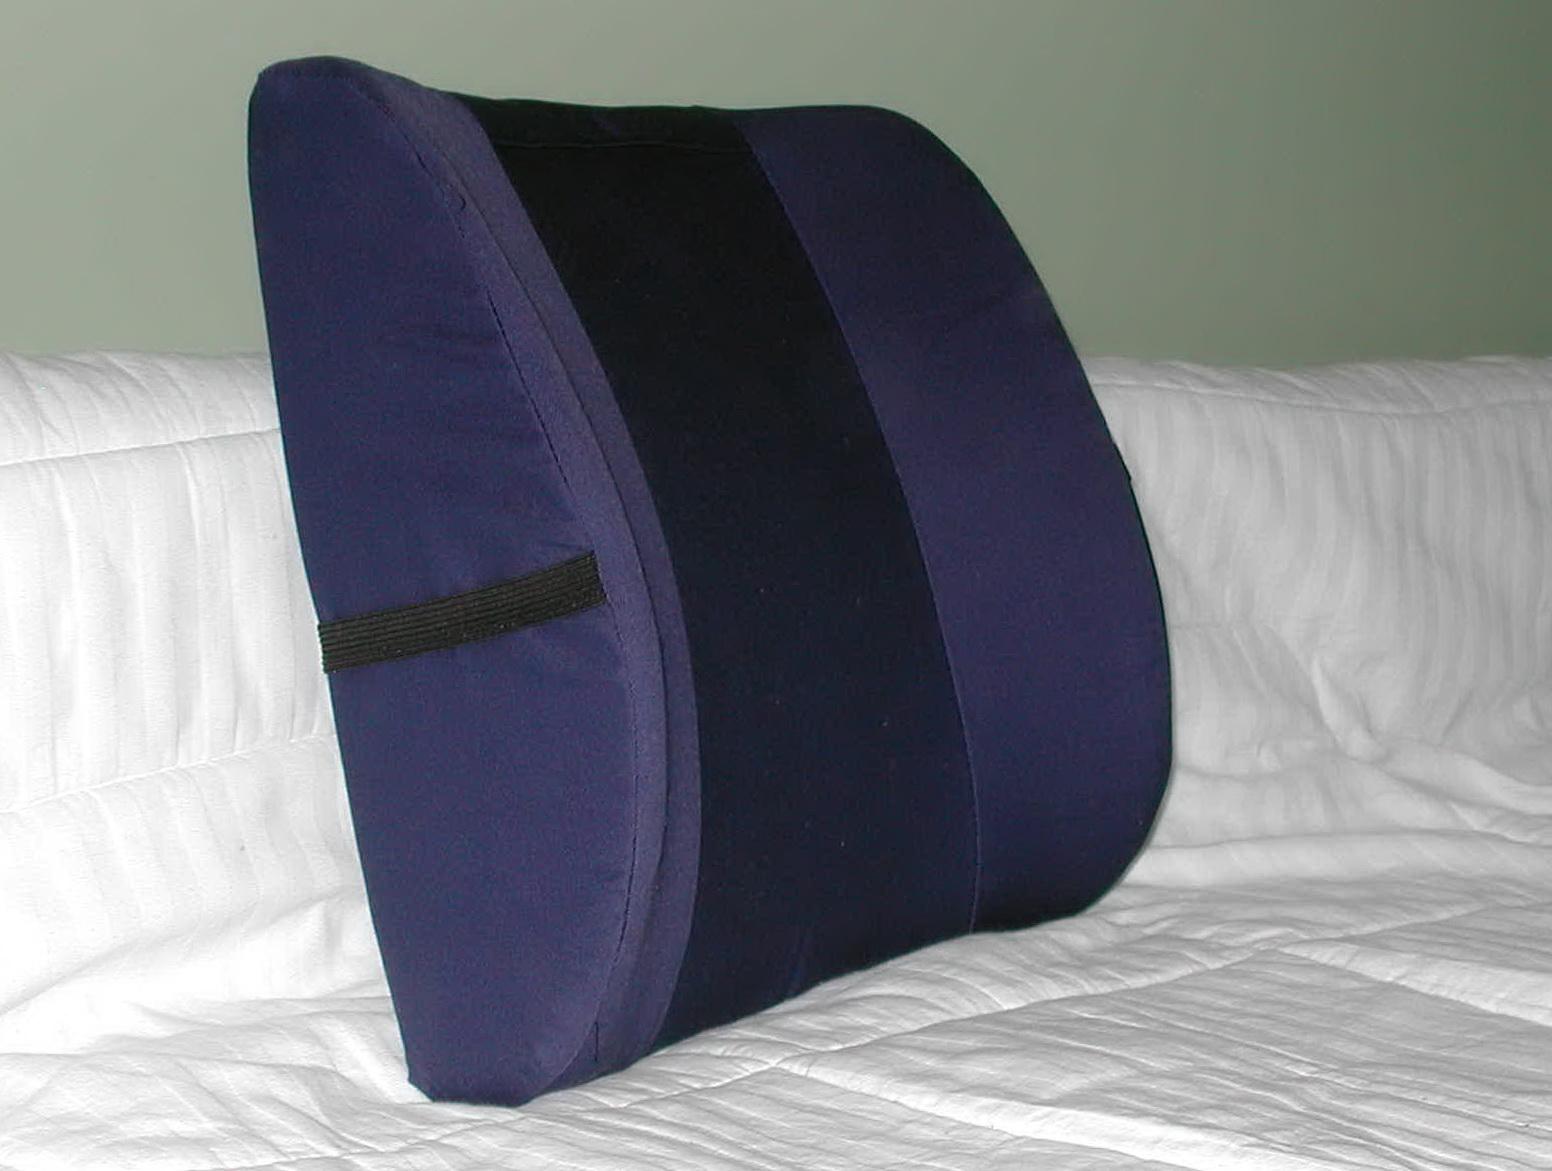 roho cushion cleaning instructions